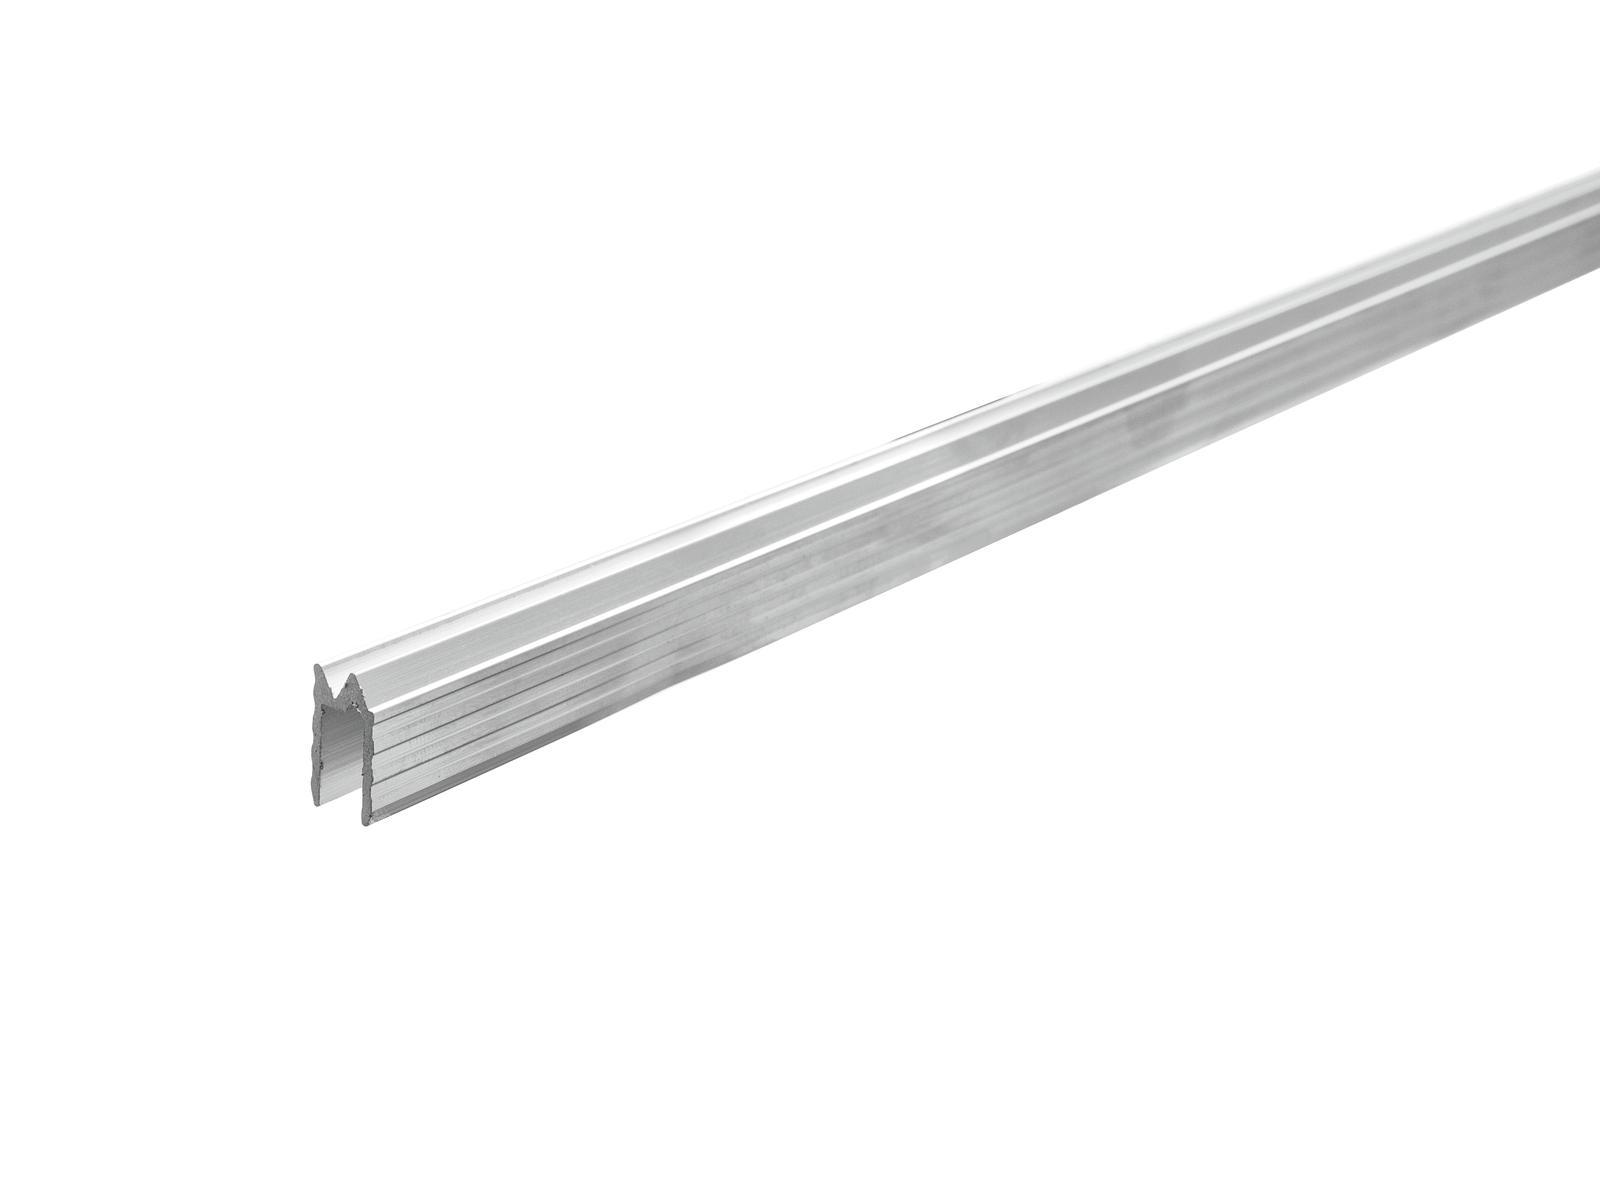 Accessory hliníková lišta 7,1mm, cena za metr